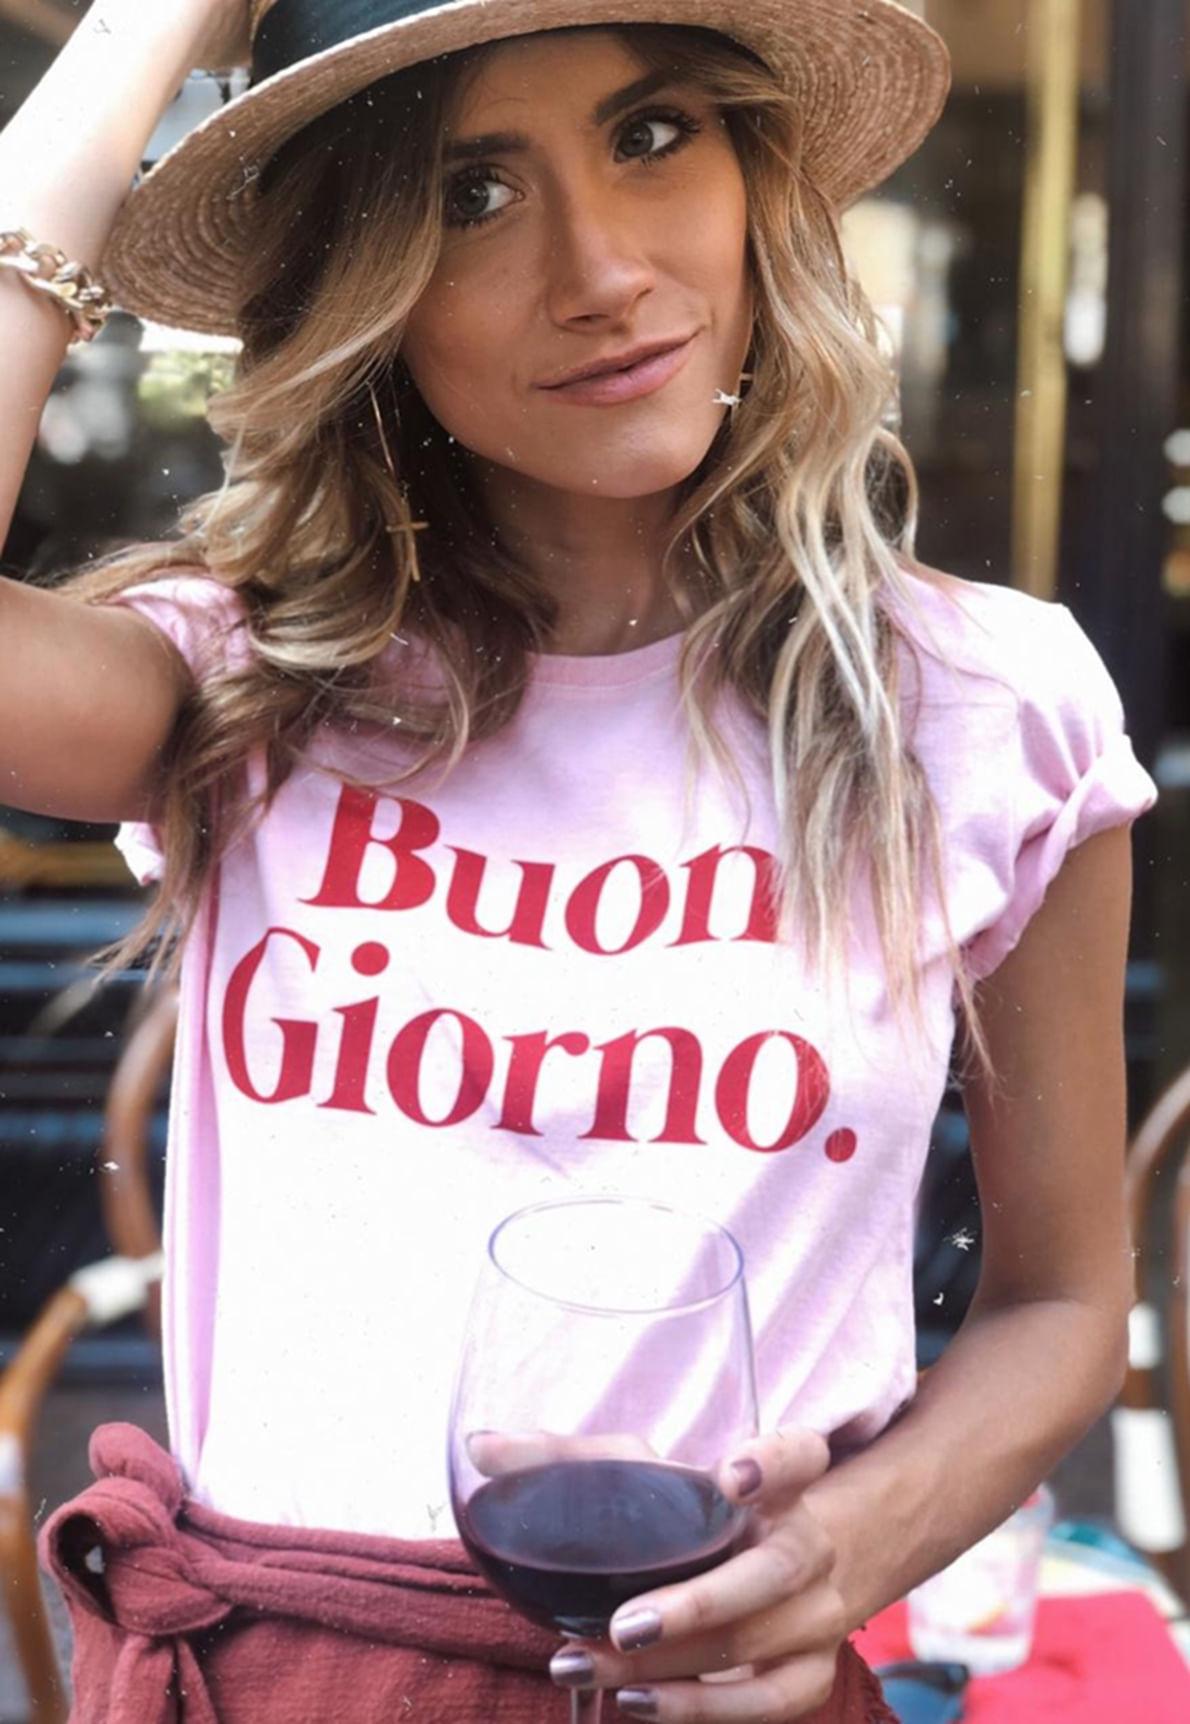 26998-t-shirt-rosa-mais-ajustada-buon-giorno-mundo-lolita-02.jpg